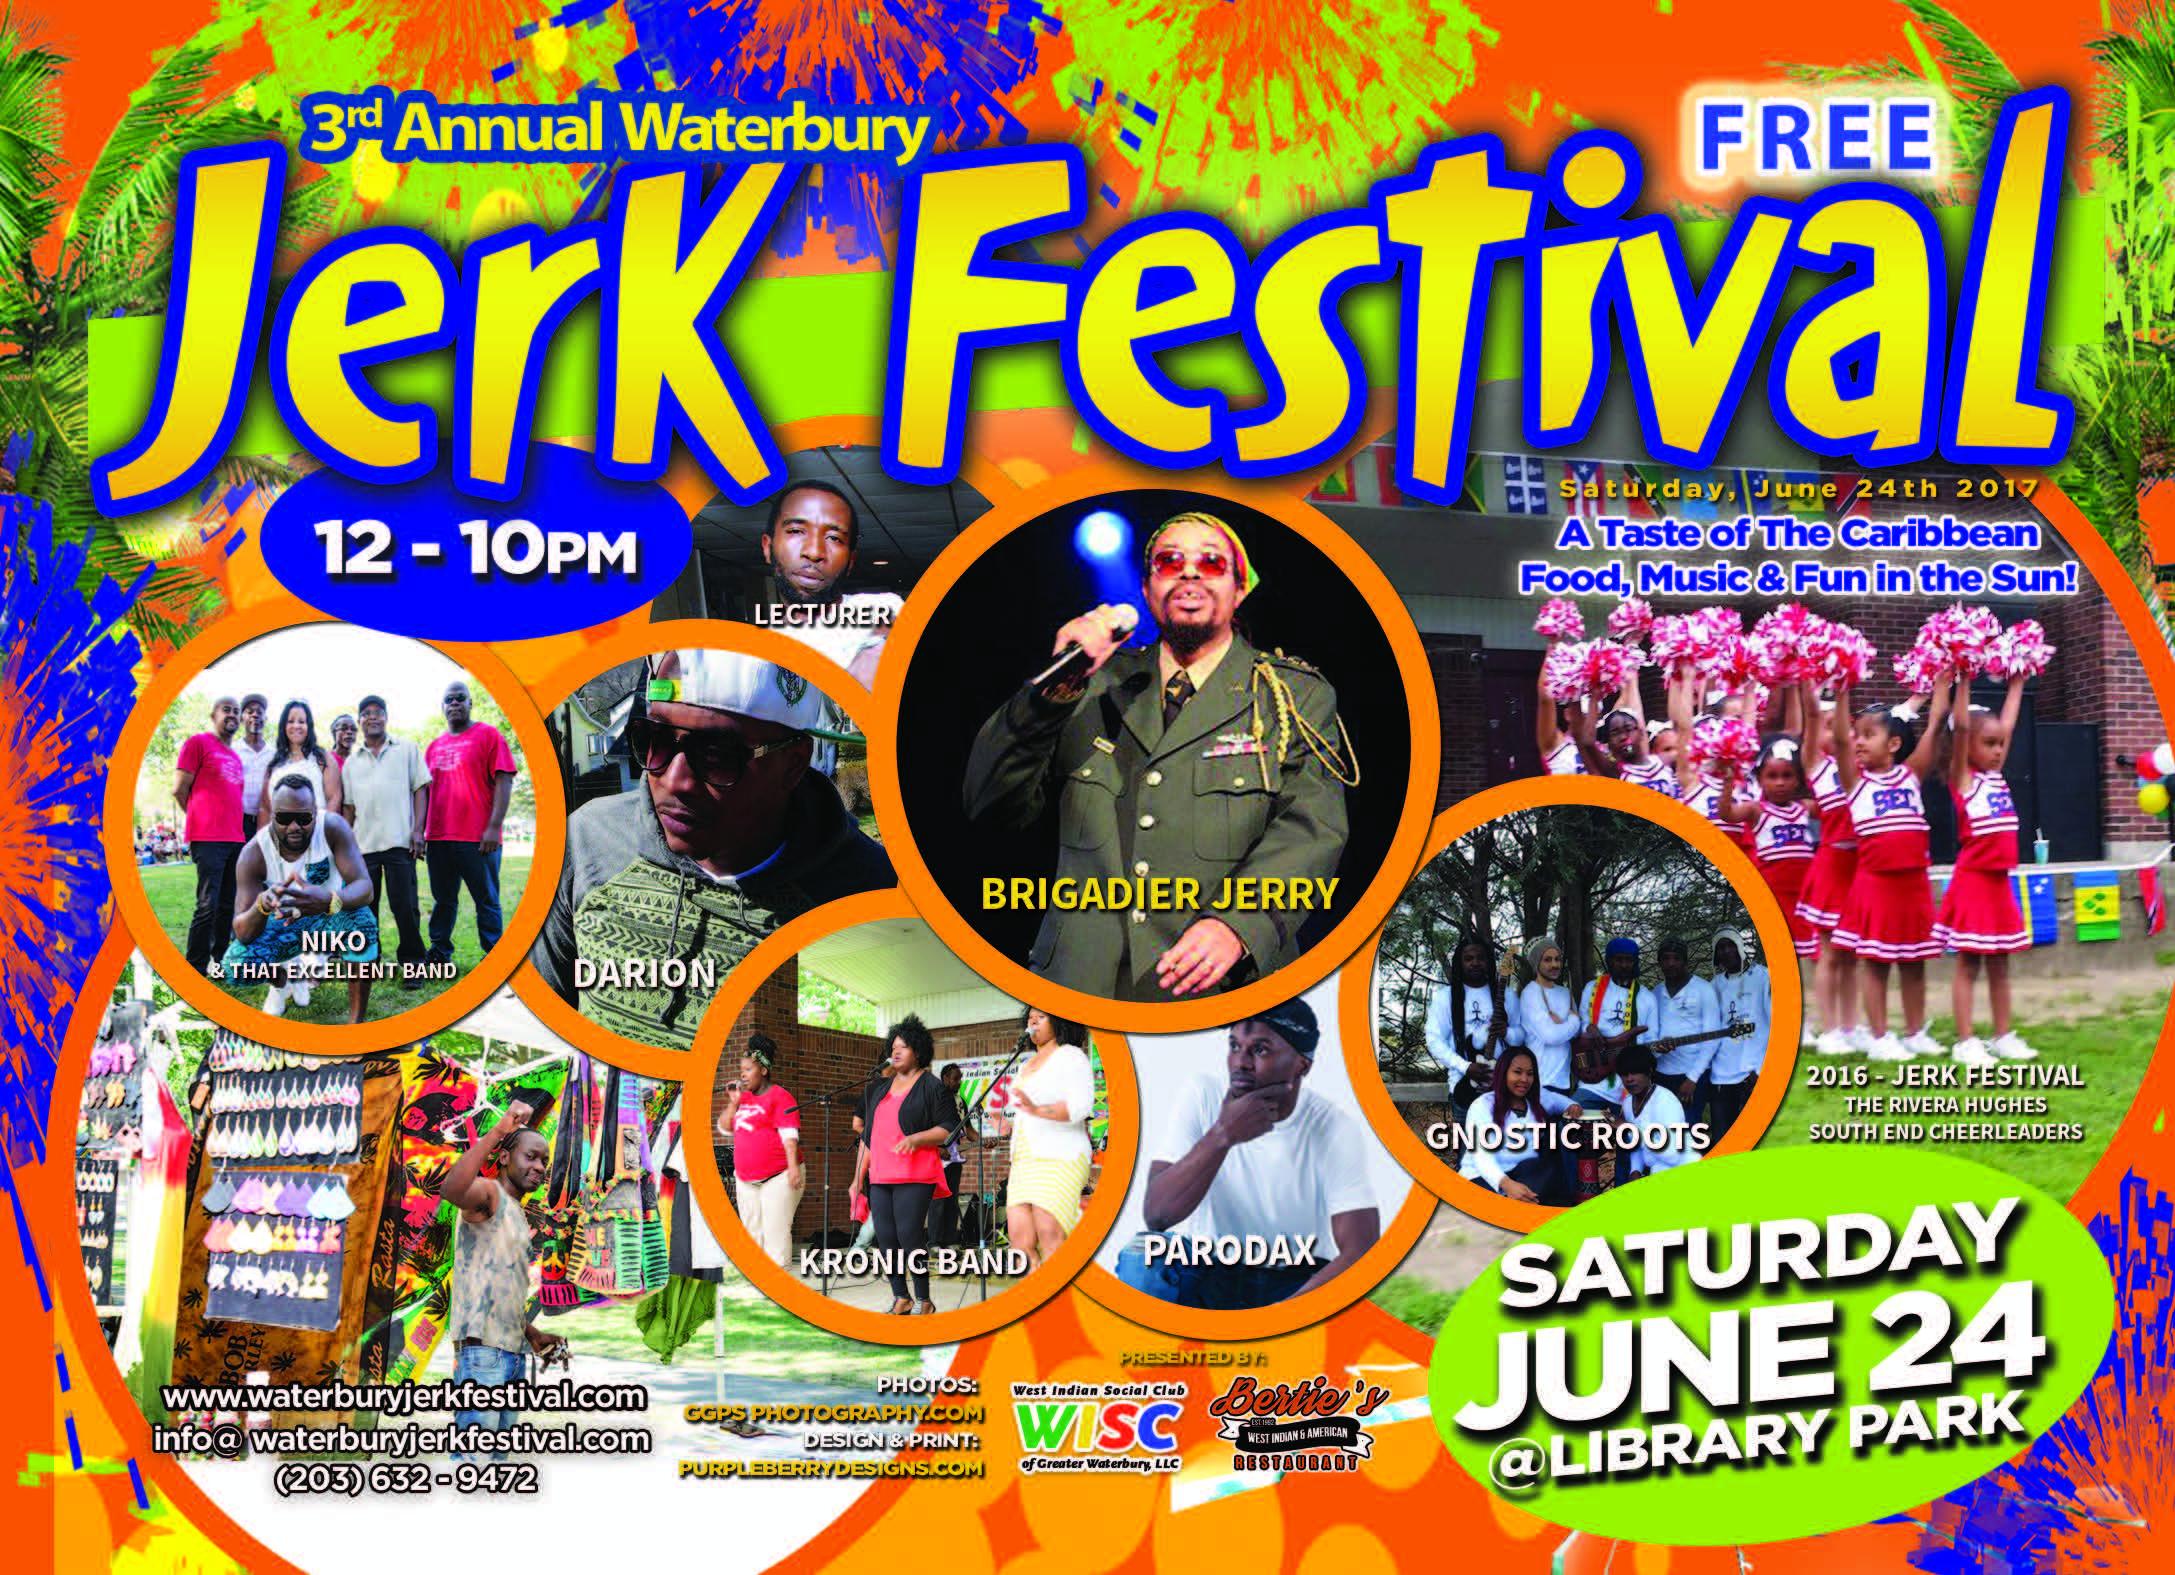 2017 Waterbury Caribbean Jerk Festival